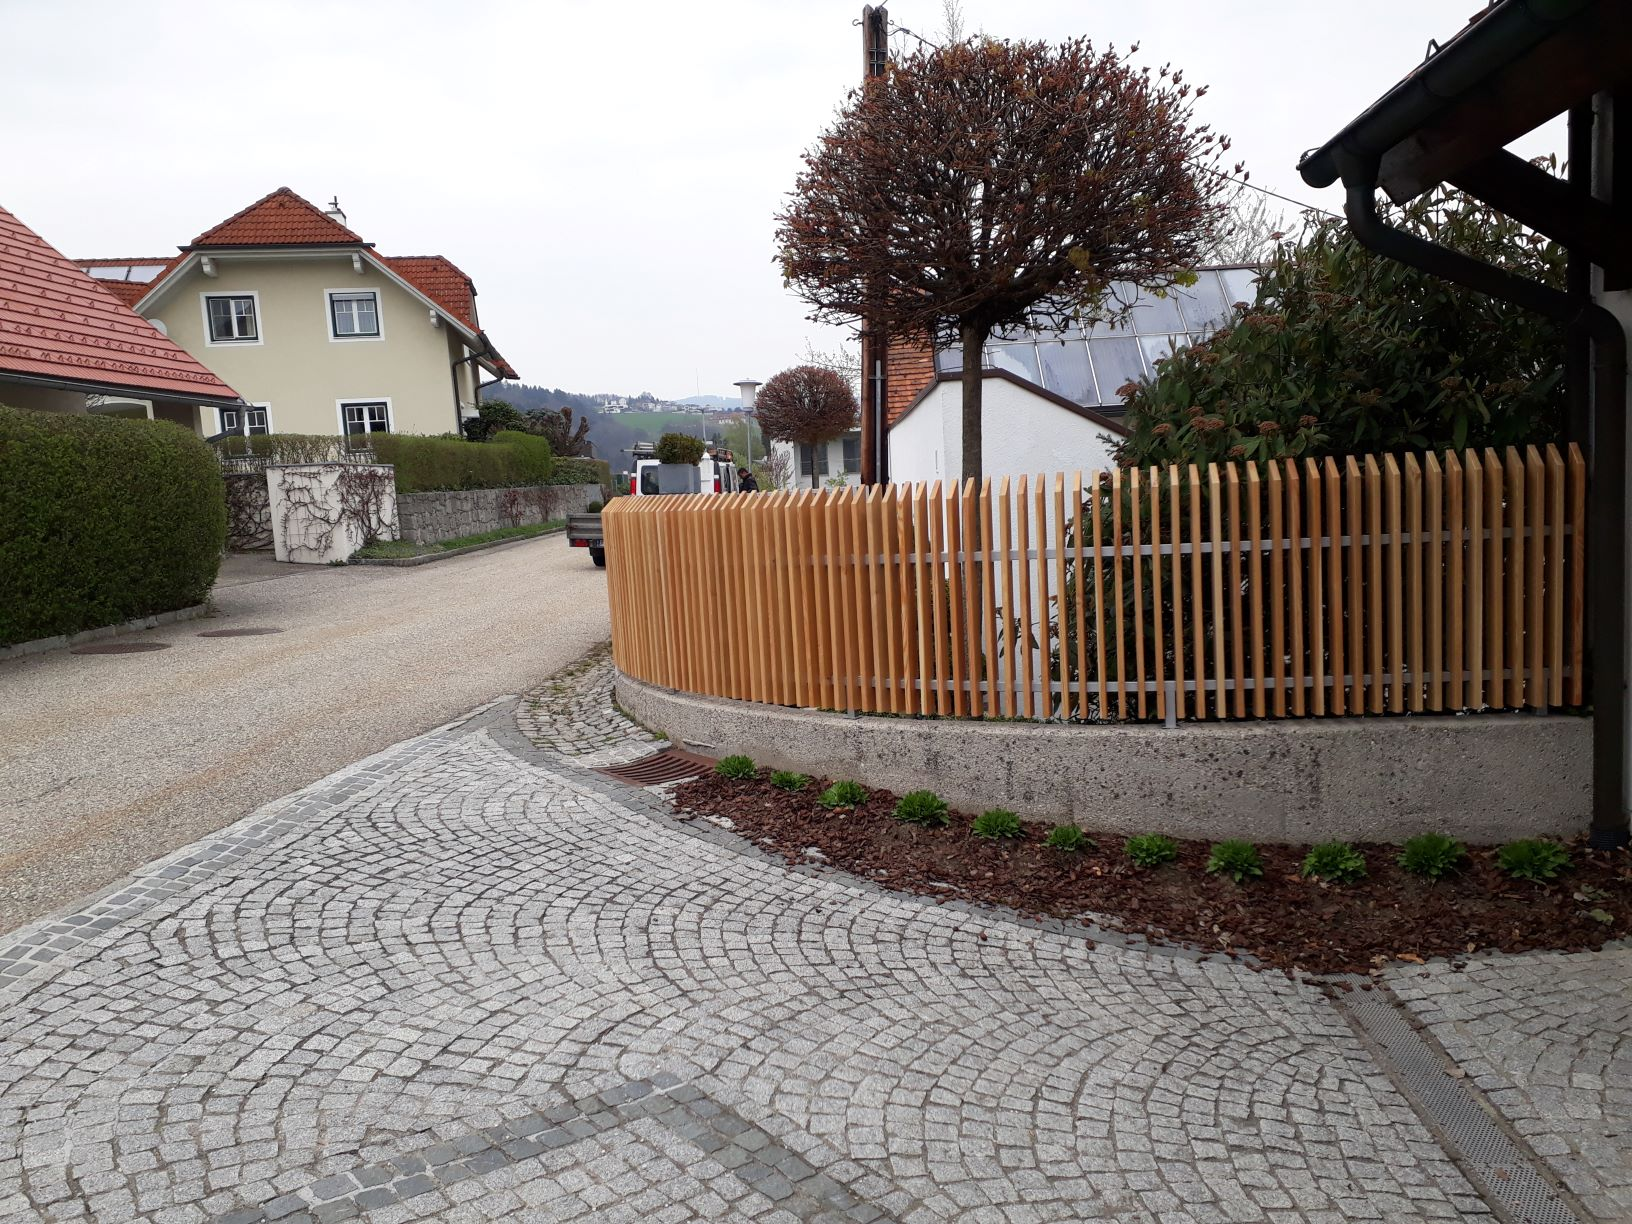 Gartenzaun_3